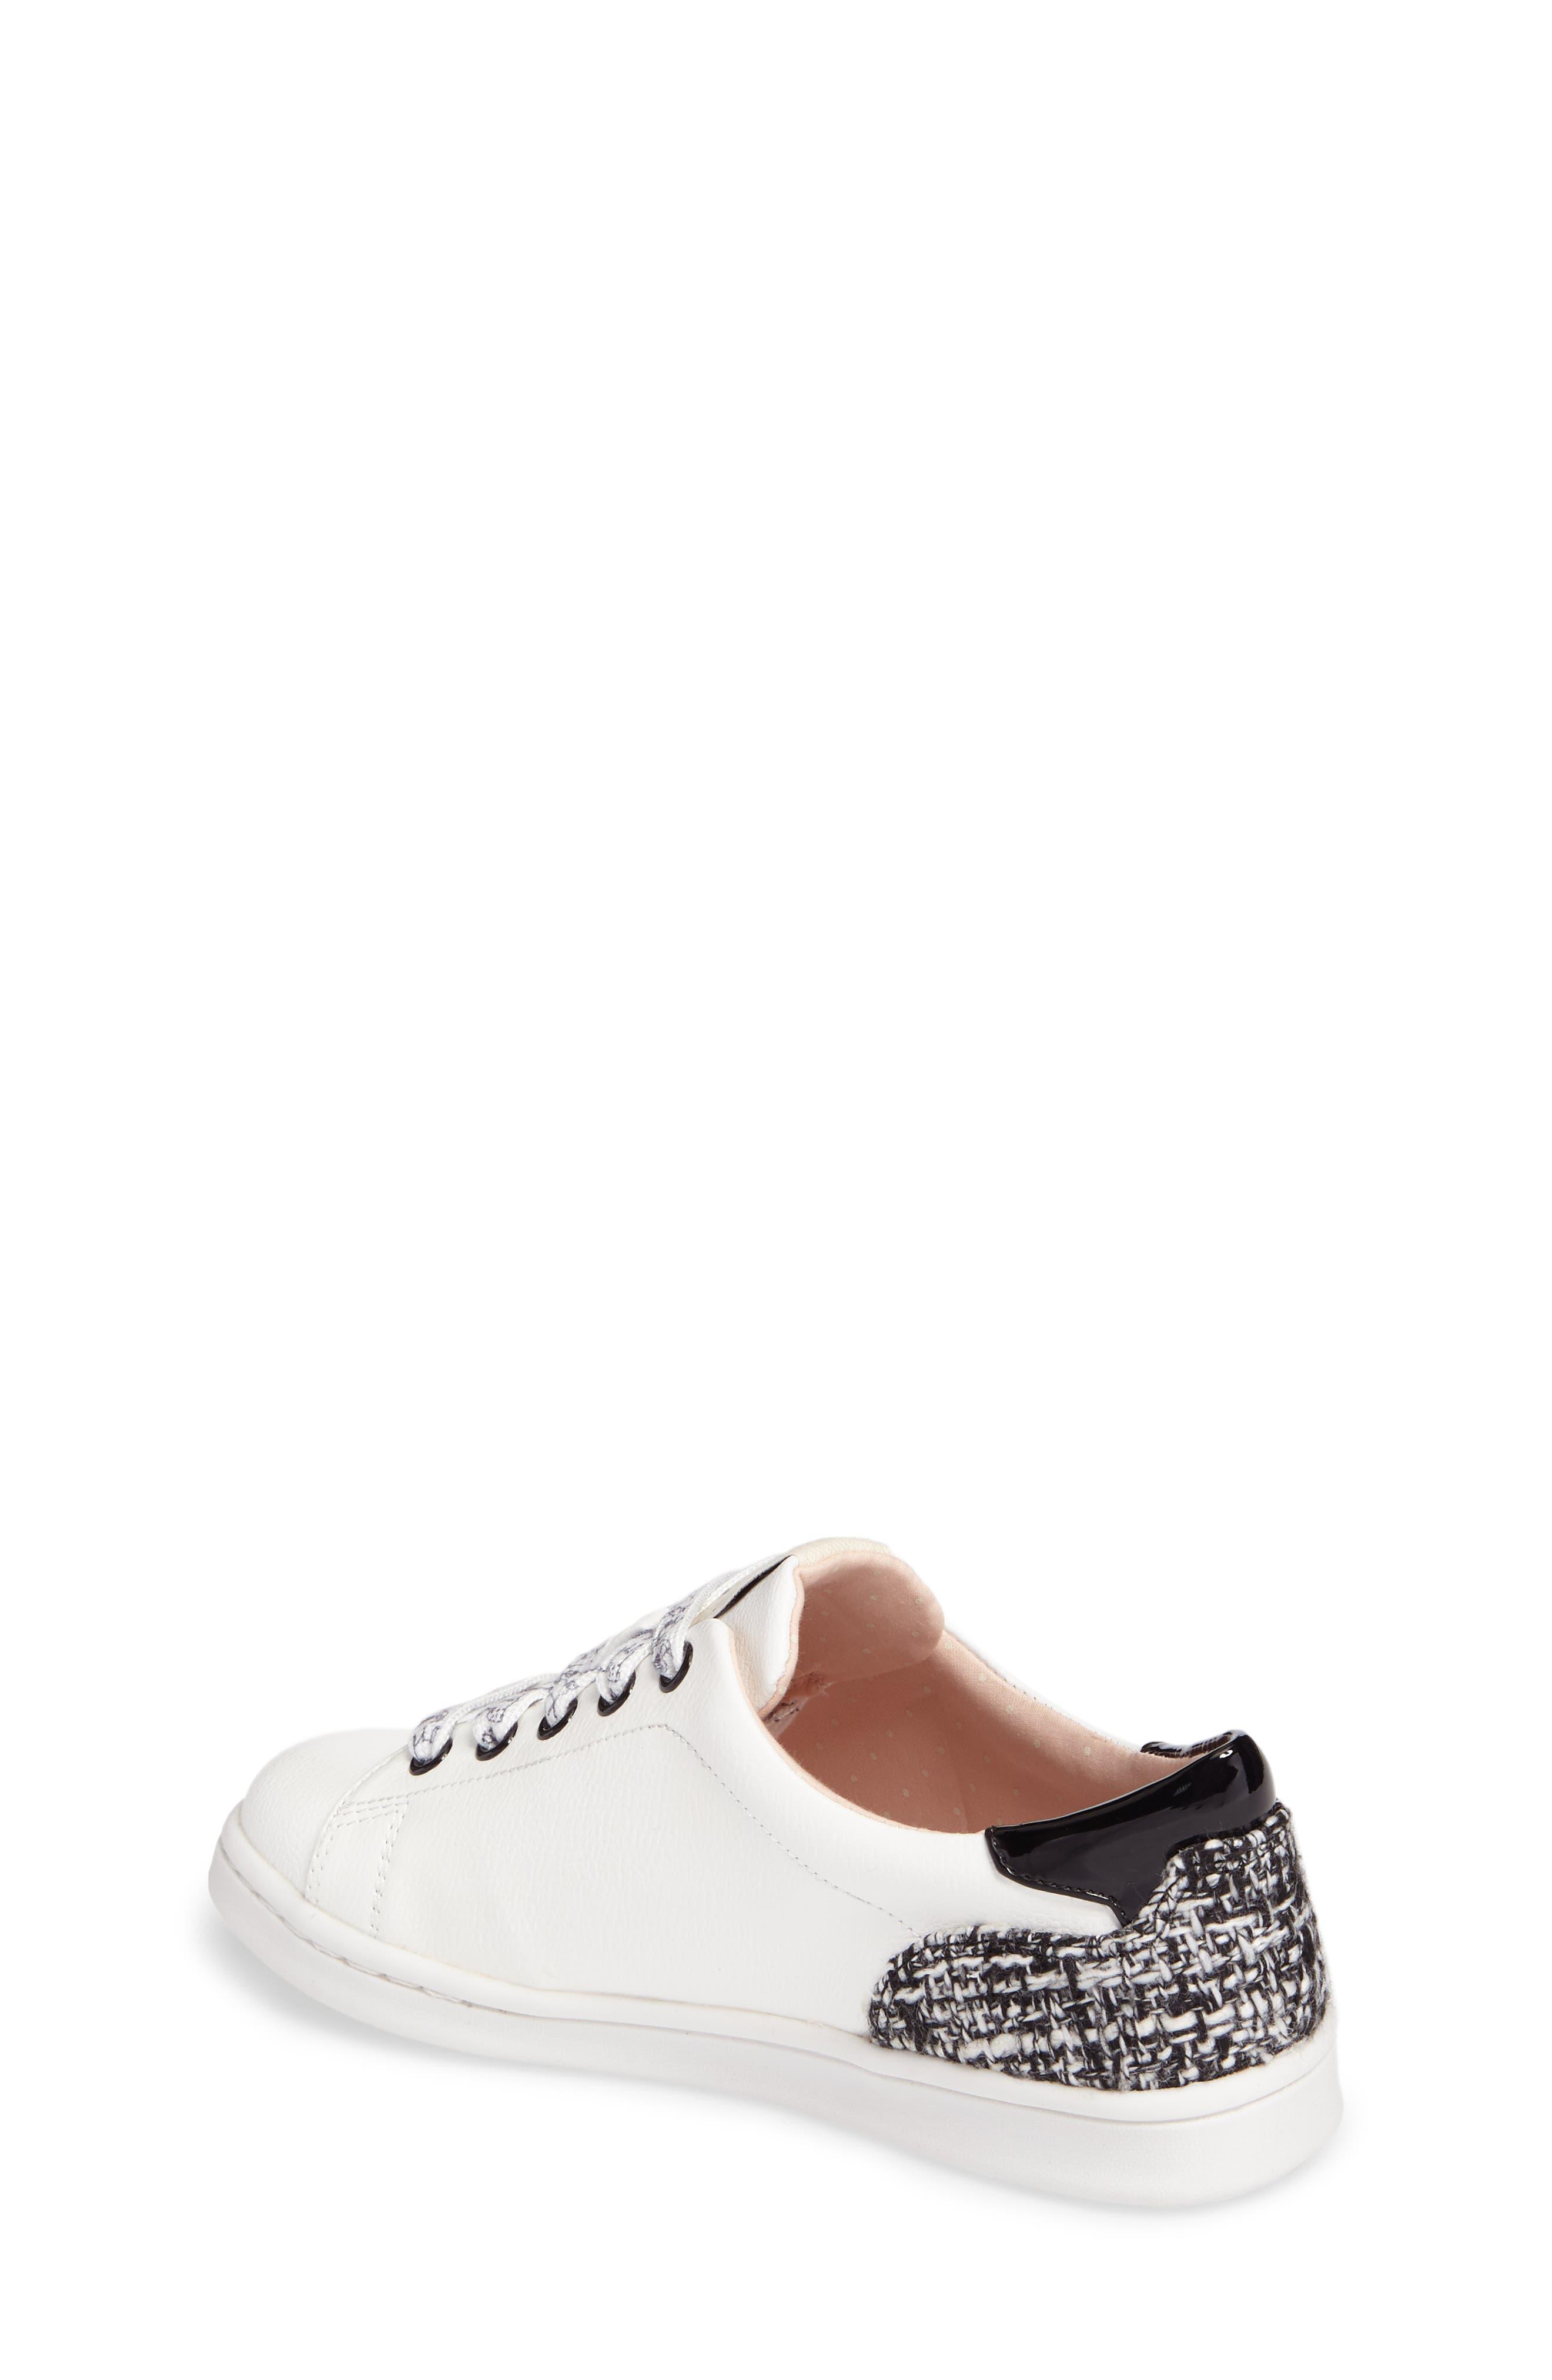 Chapapup Sneaker,                             Alternate thumbnail 2, color,                             WHITE